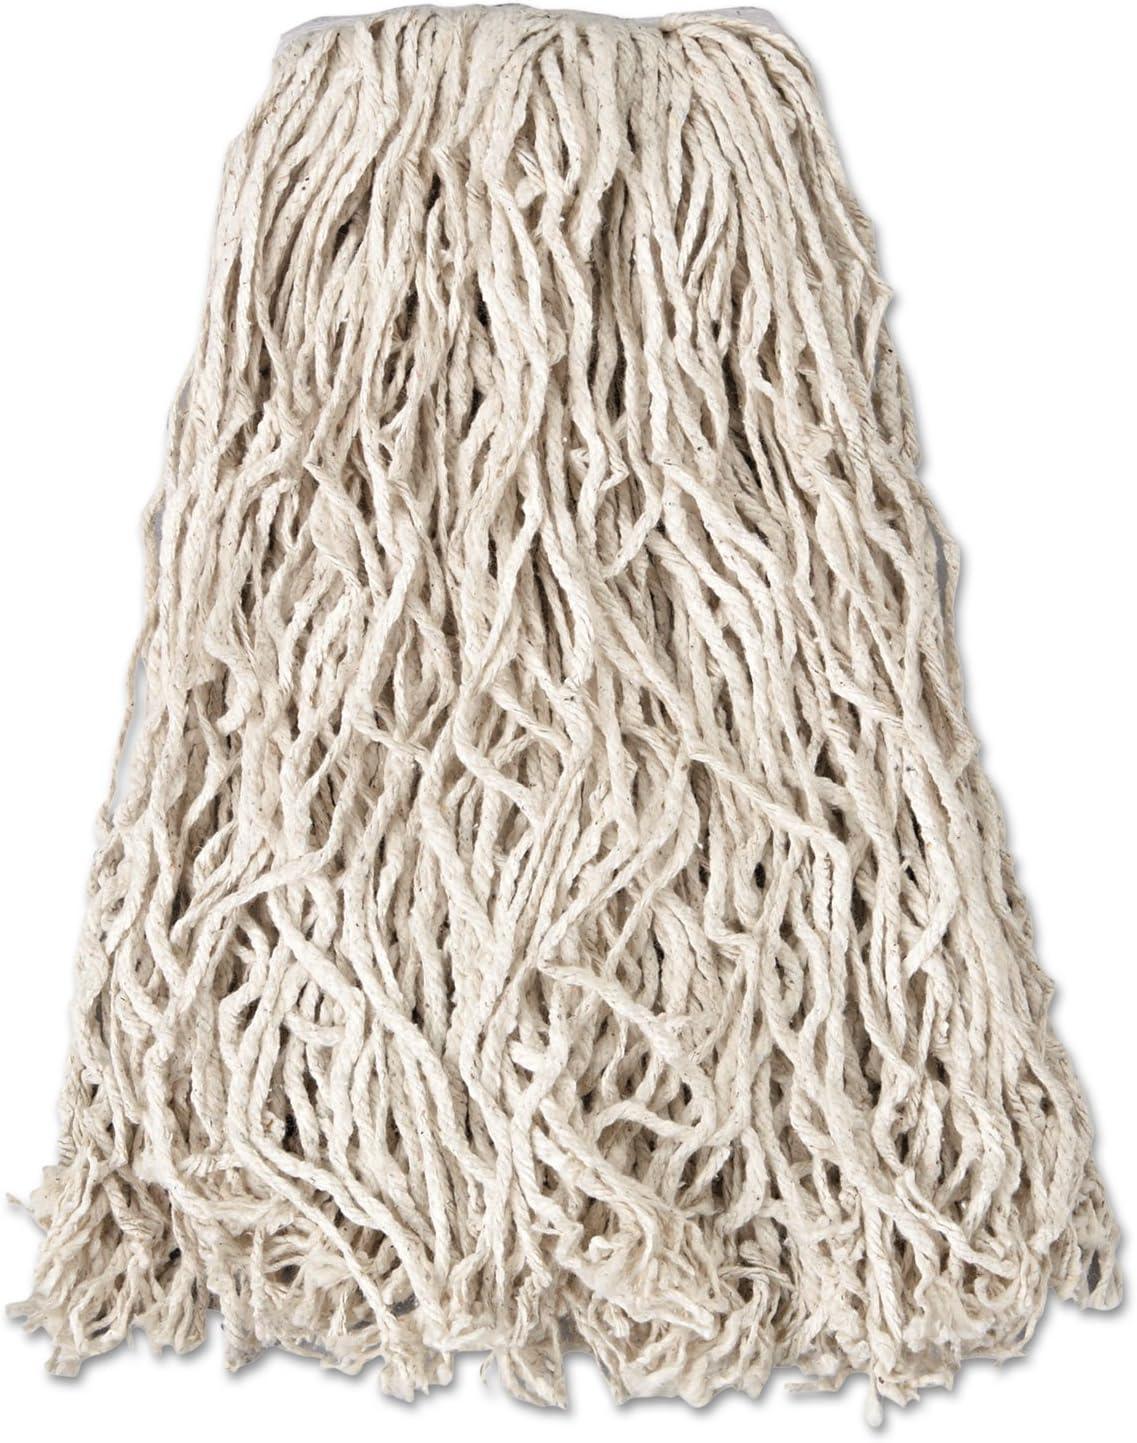 Rubbermaid Commercial Max 49% OFF Alternative dealer V117 Economy Cut-End Wet Head Cotton Mop